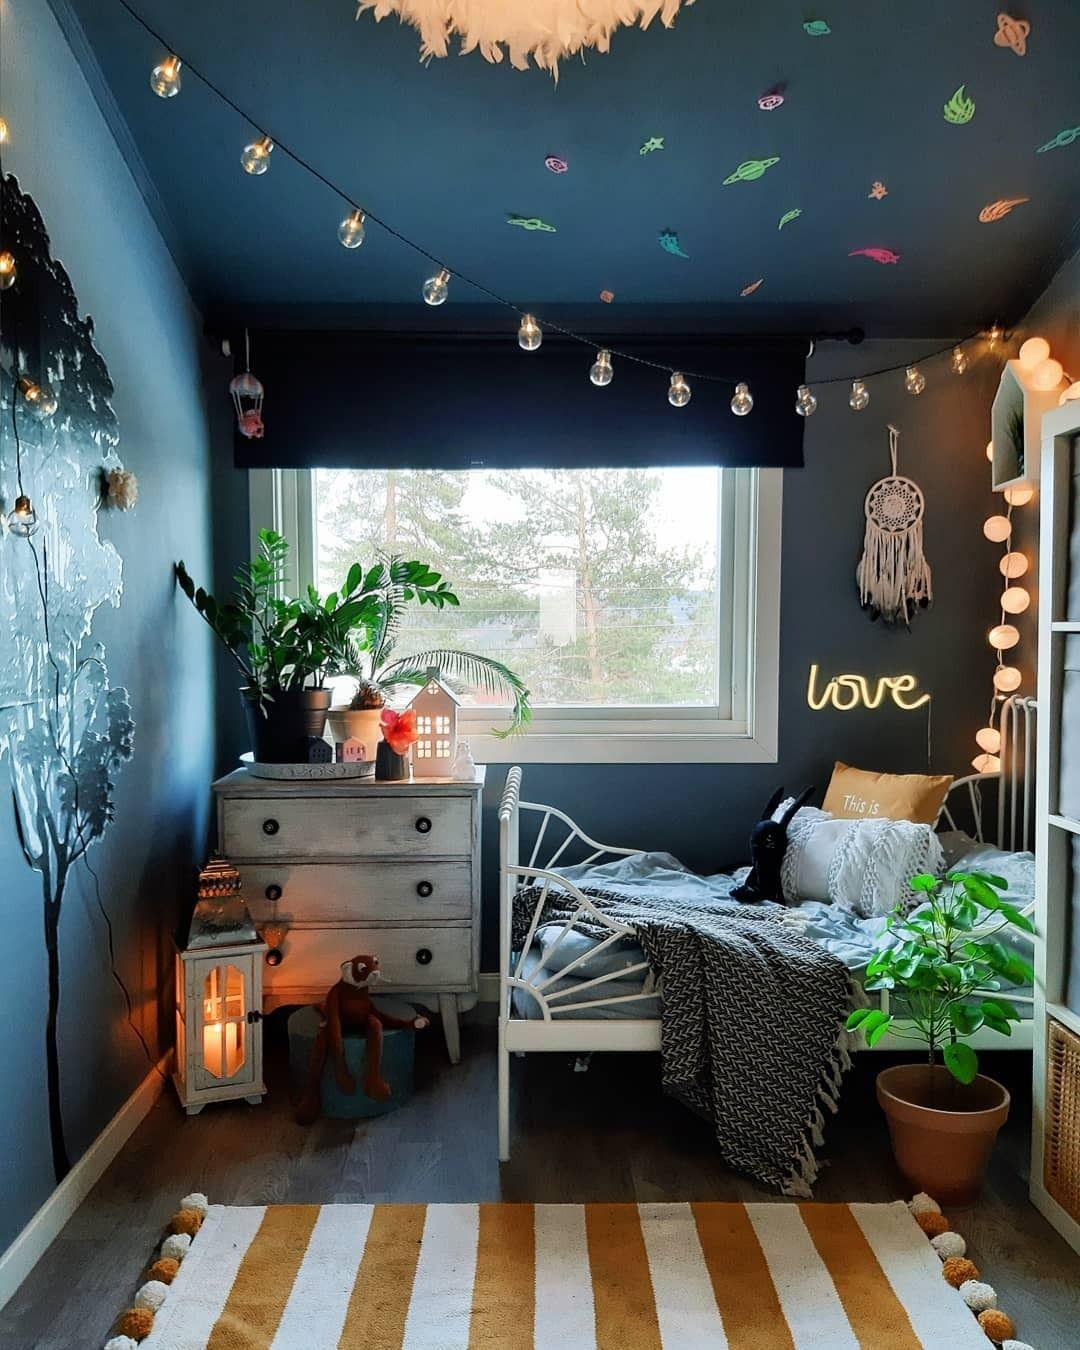 home interior design — cozy little bedroom | bedroom decor, decor, bohemian bedroom decor